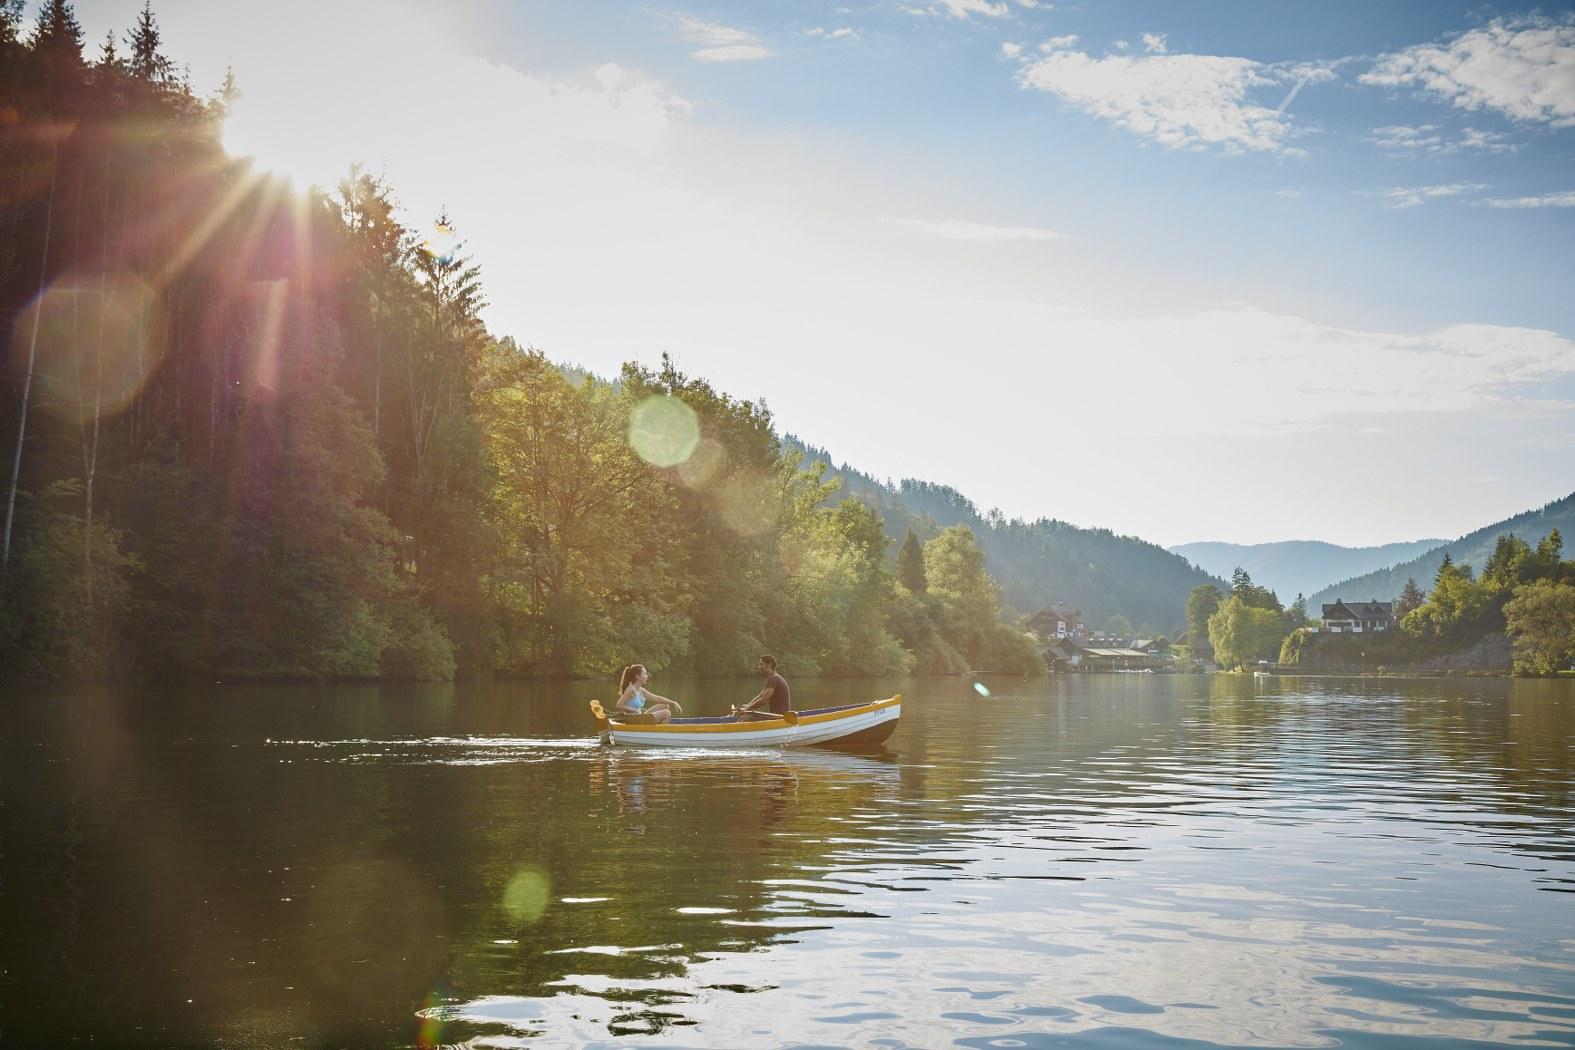 озеро Лунцер-Зе, (c) Niederösterreich Werbung / Michael Liebert